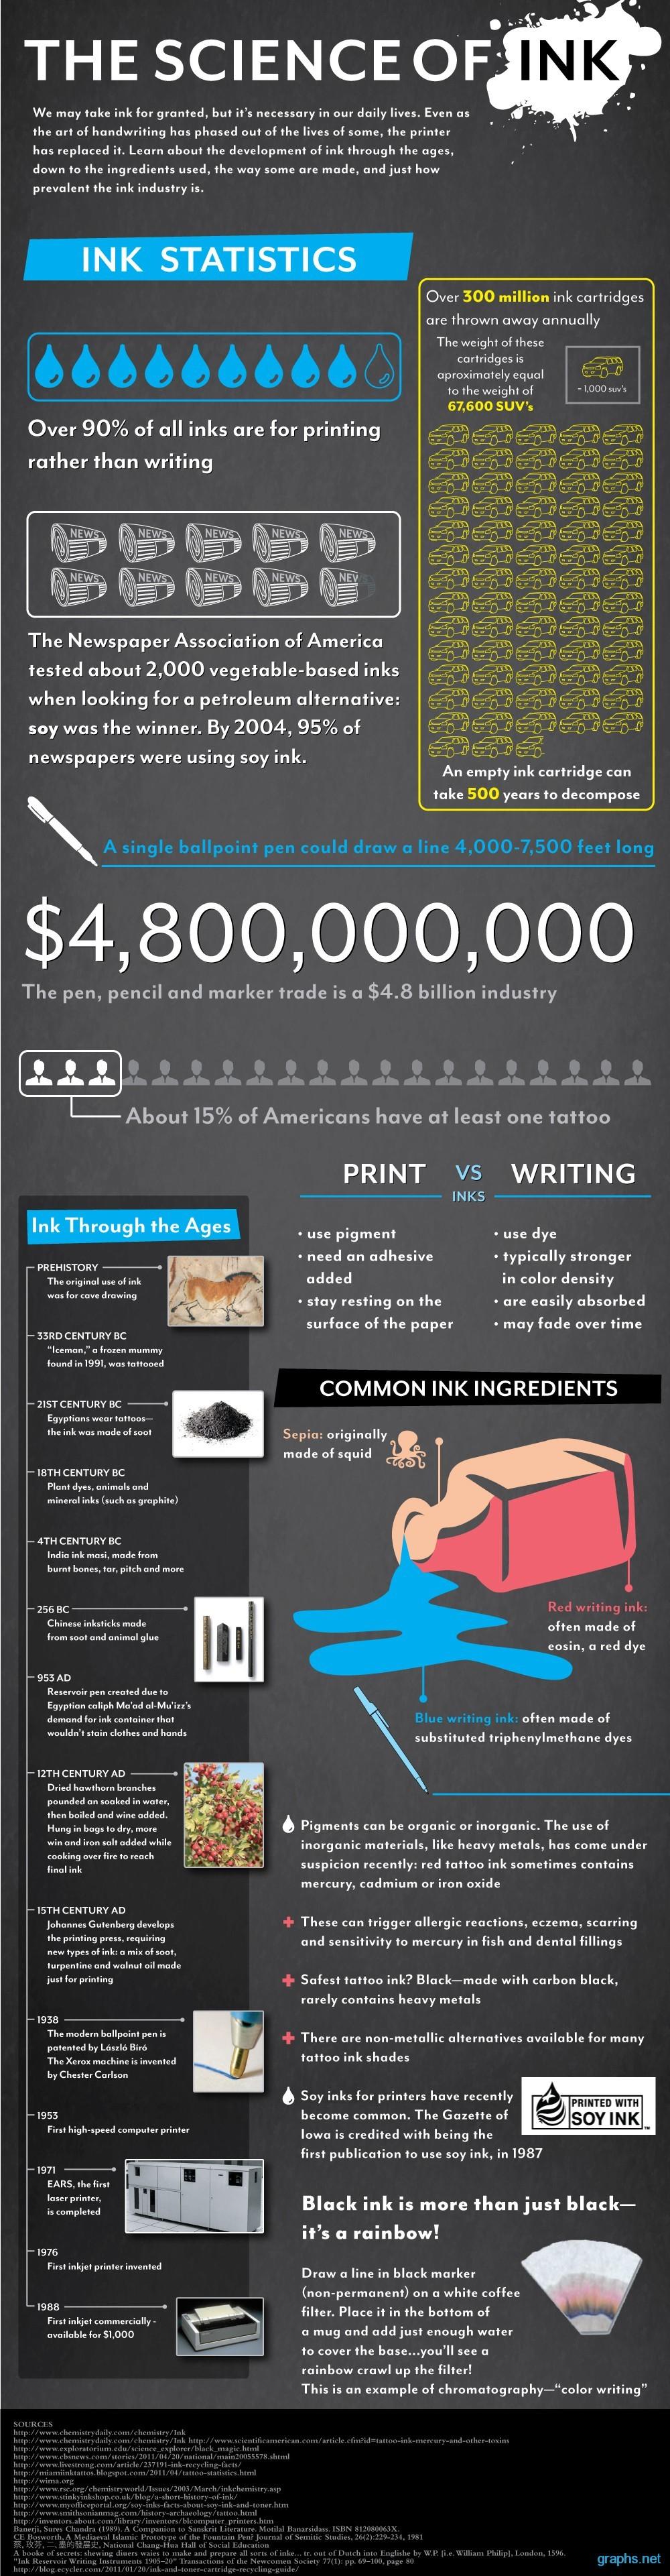 ink statistics